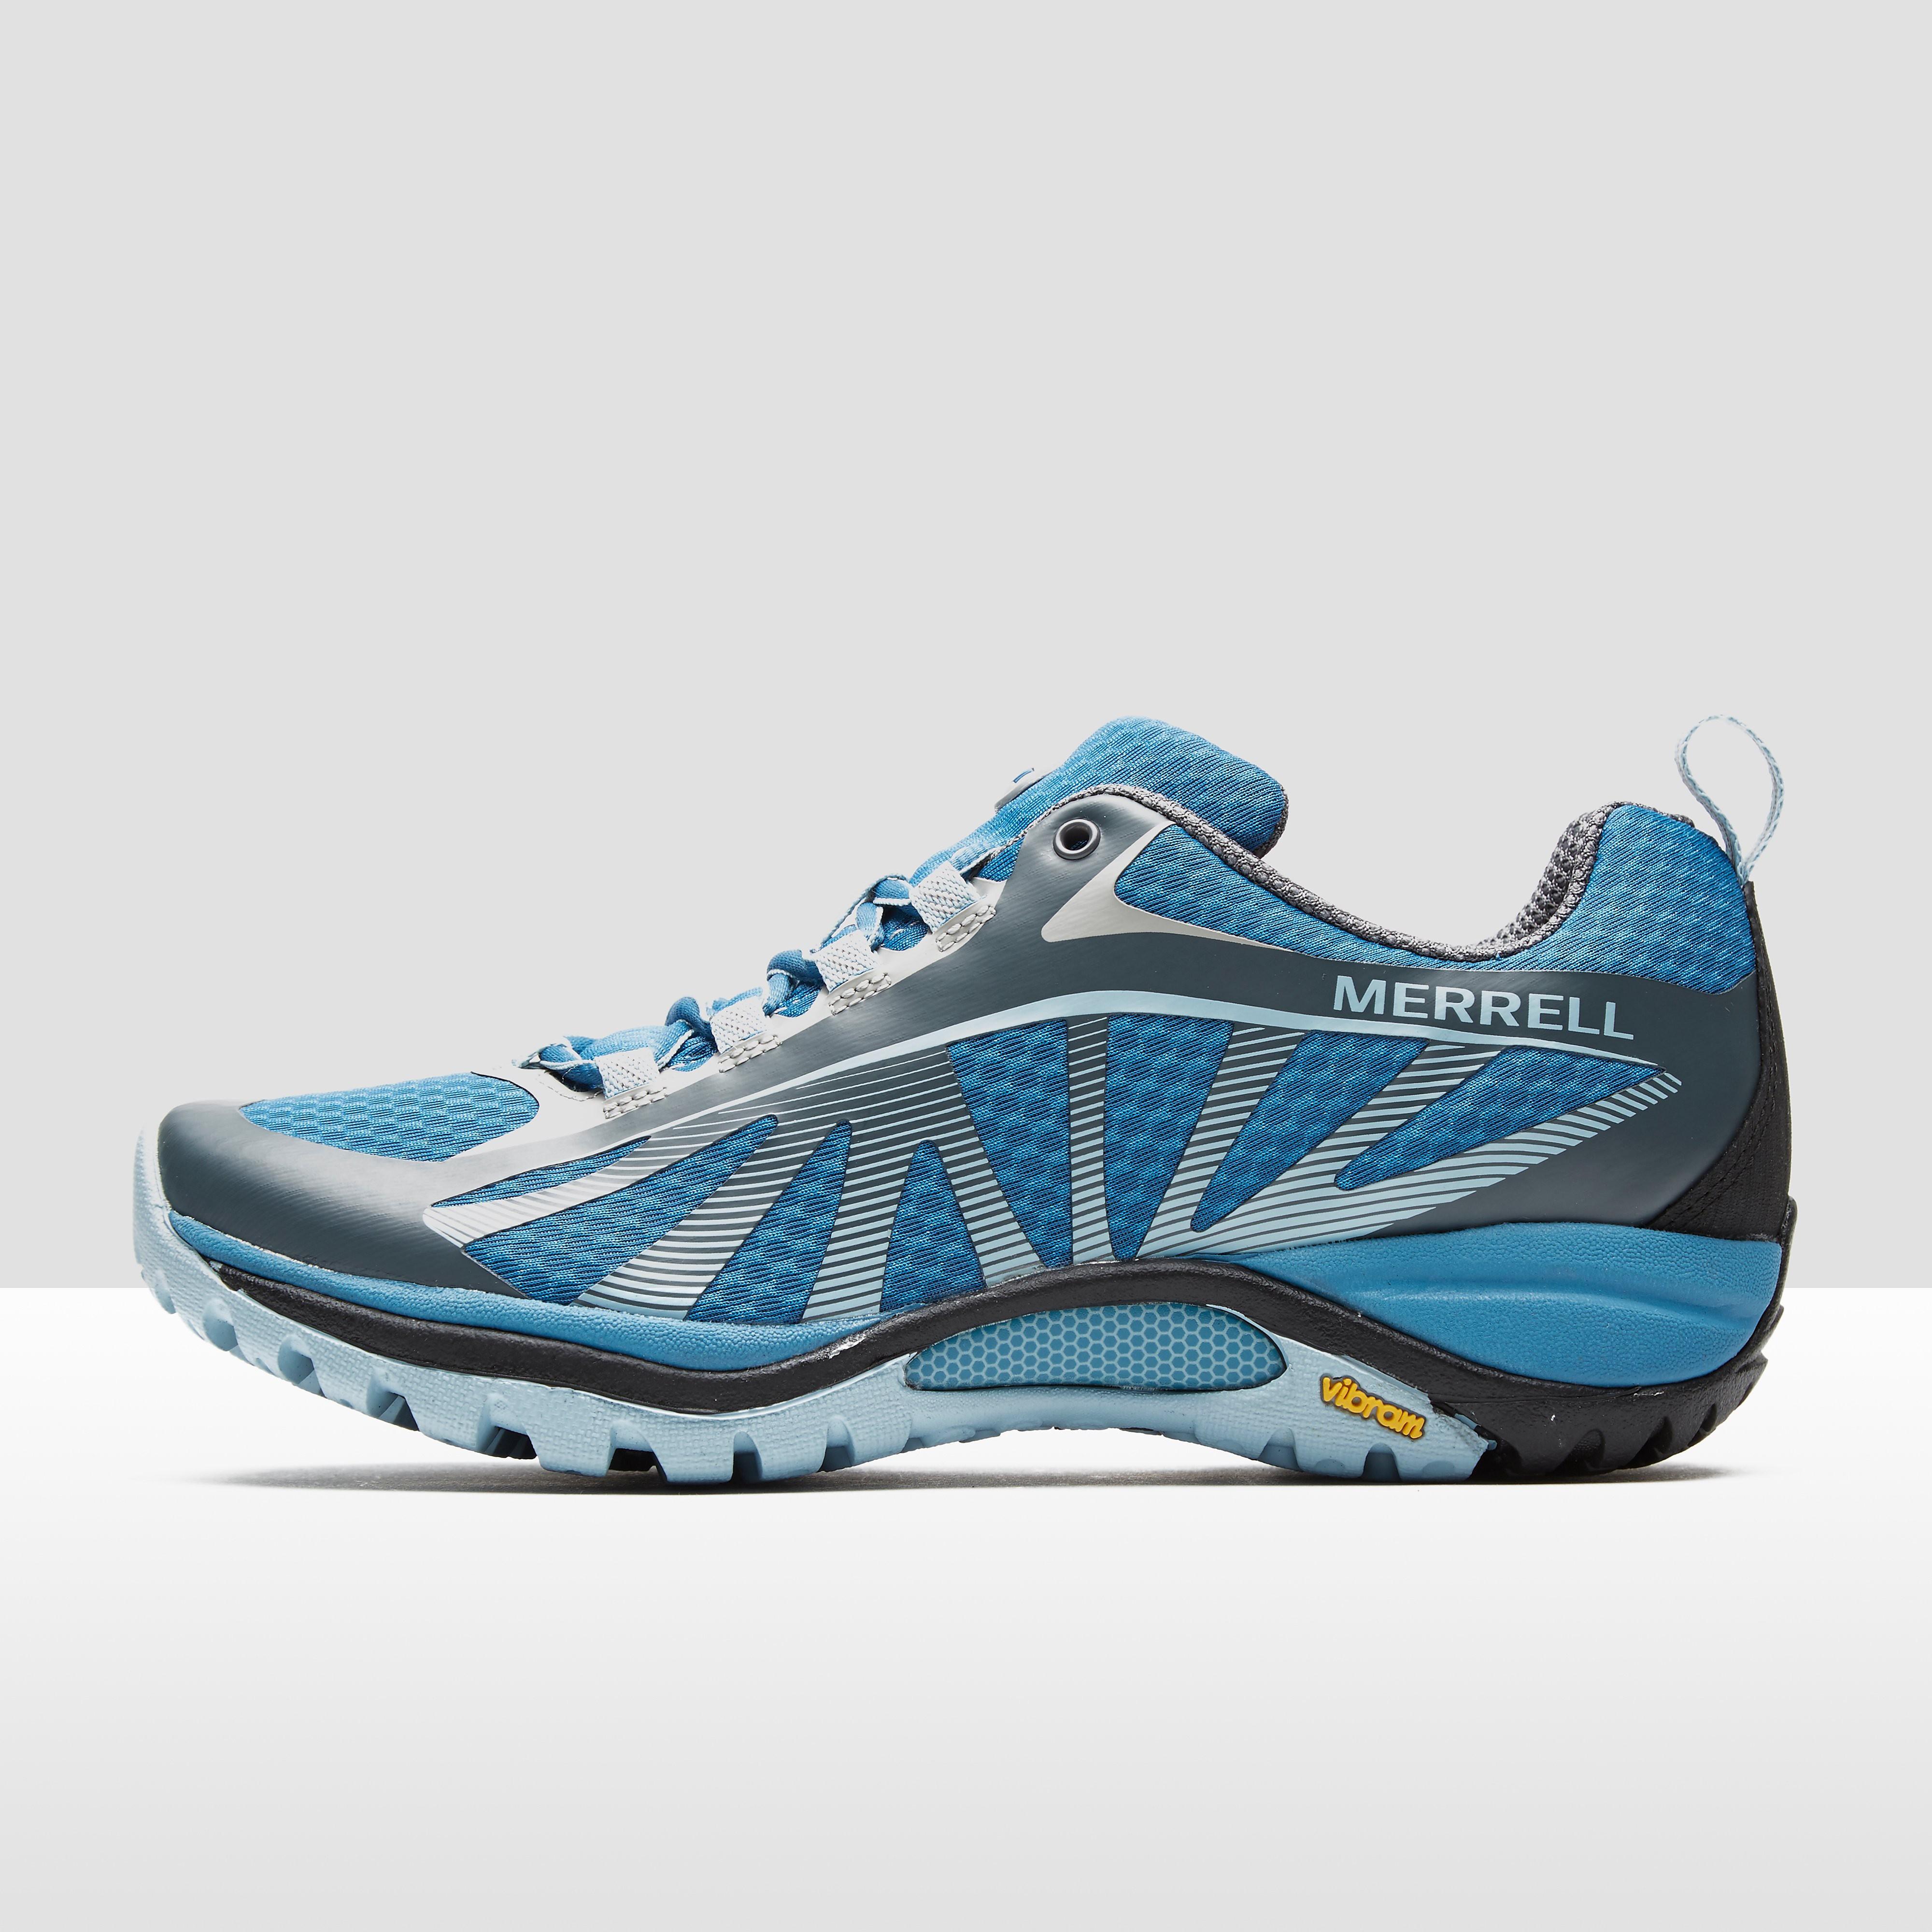 Merrell Siren Edge Women's Hiking Shoes